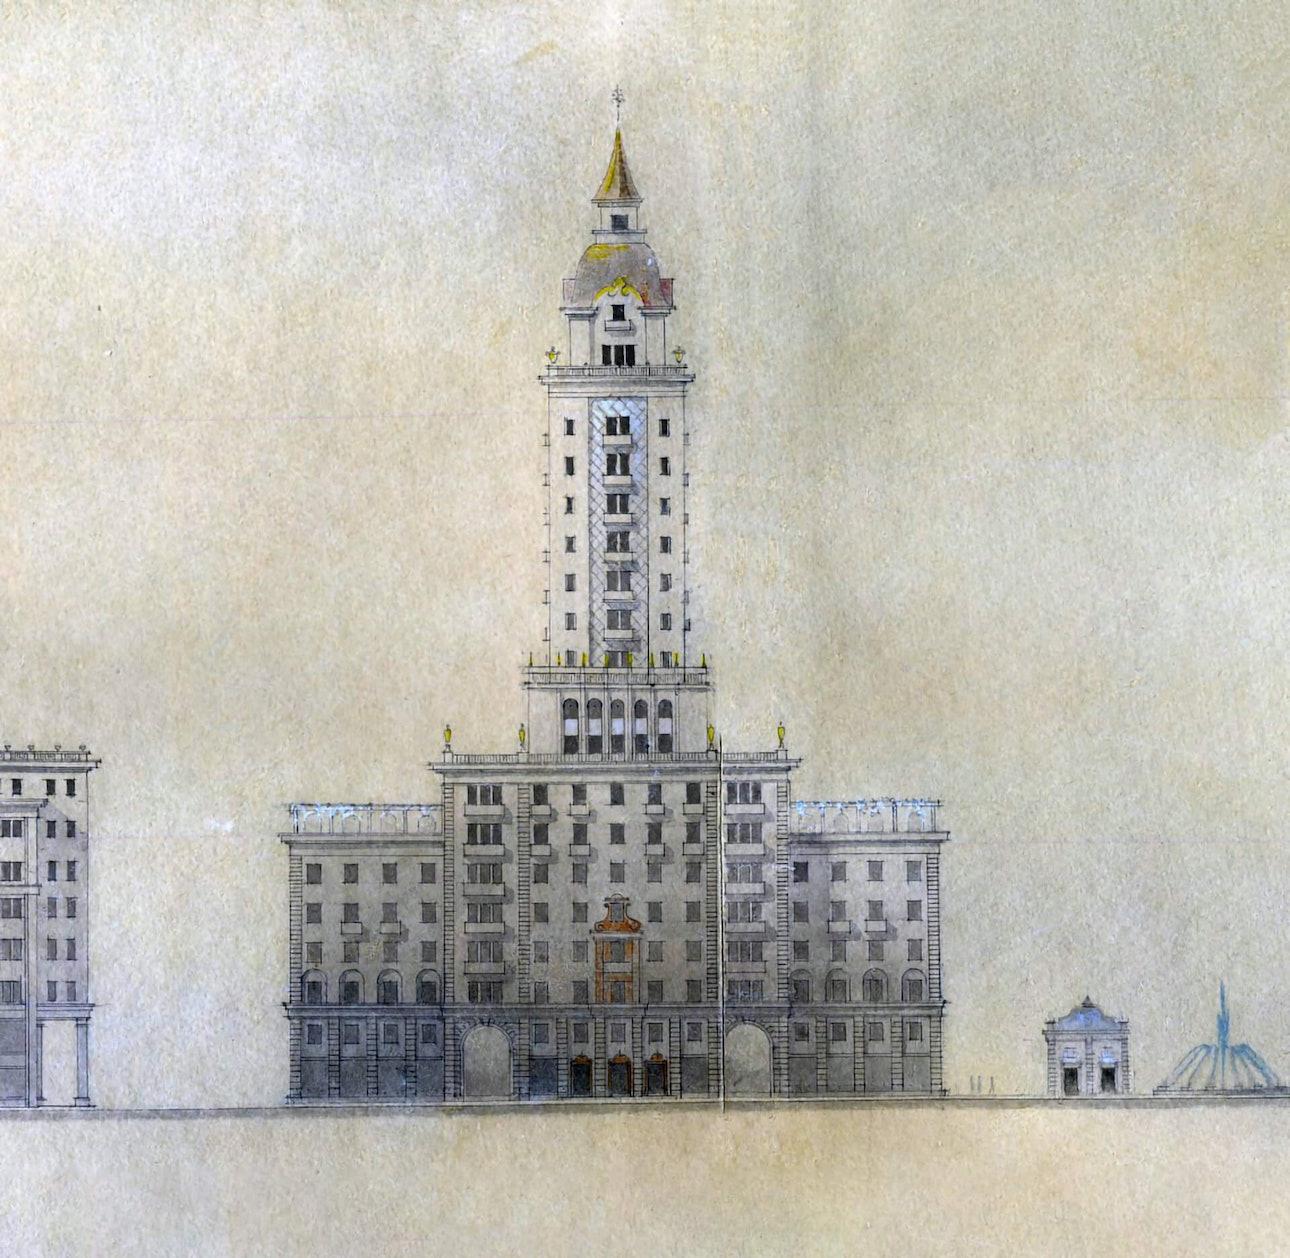 architecture_new_1944 Алёшин гостиница (София Киевская)